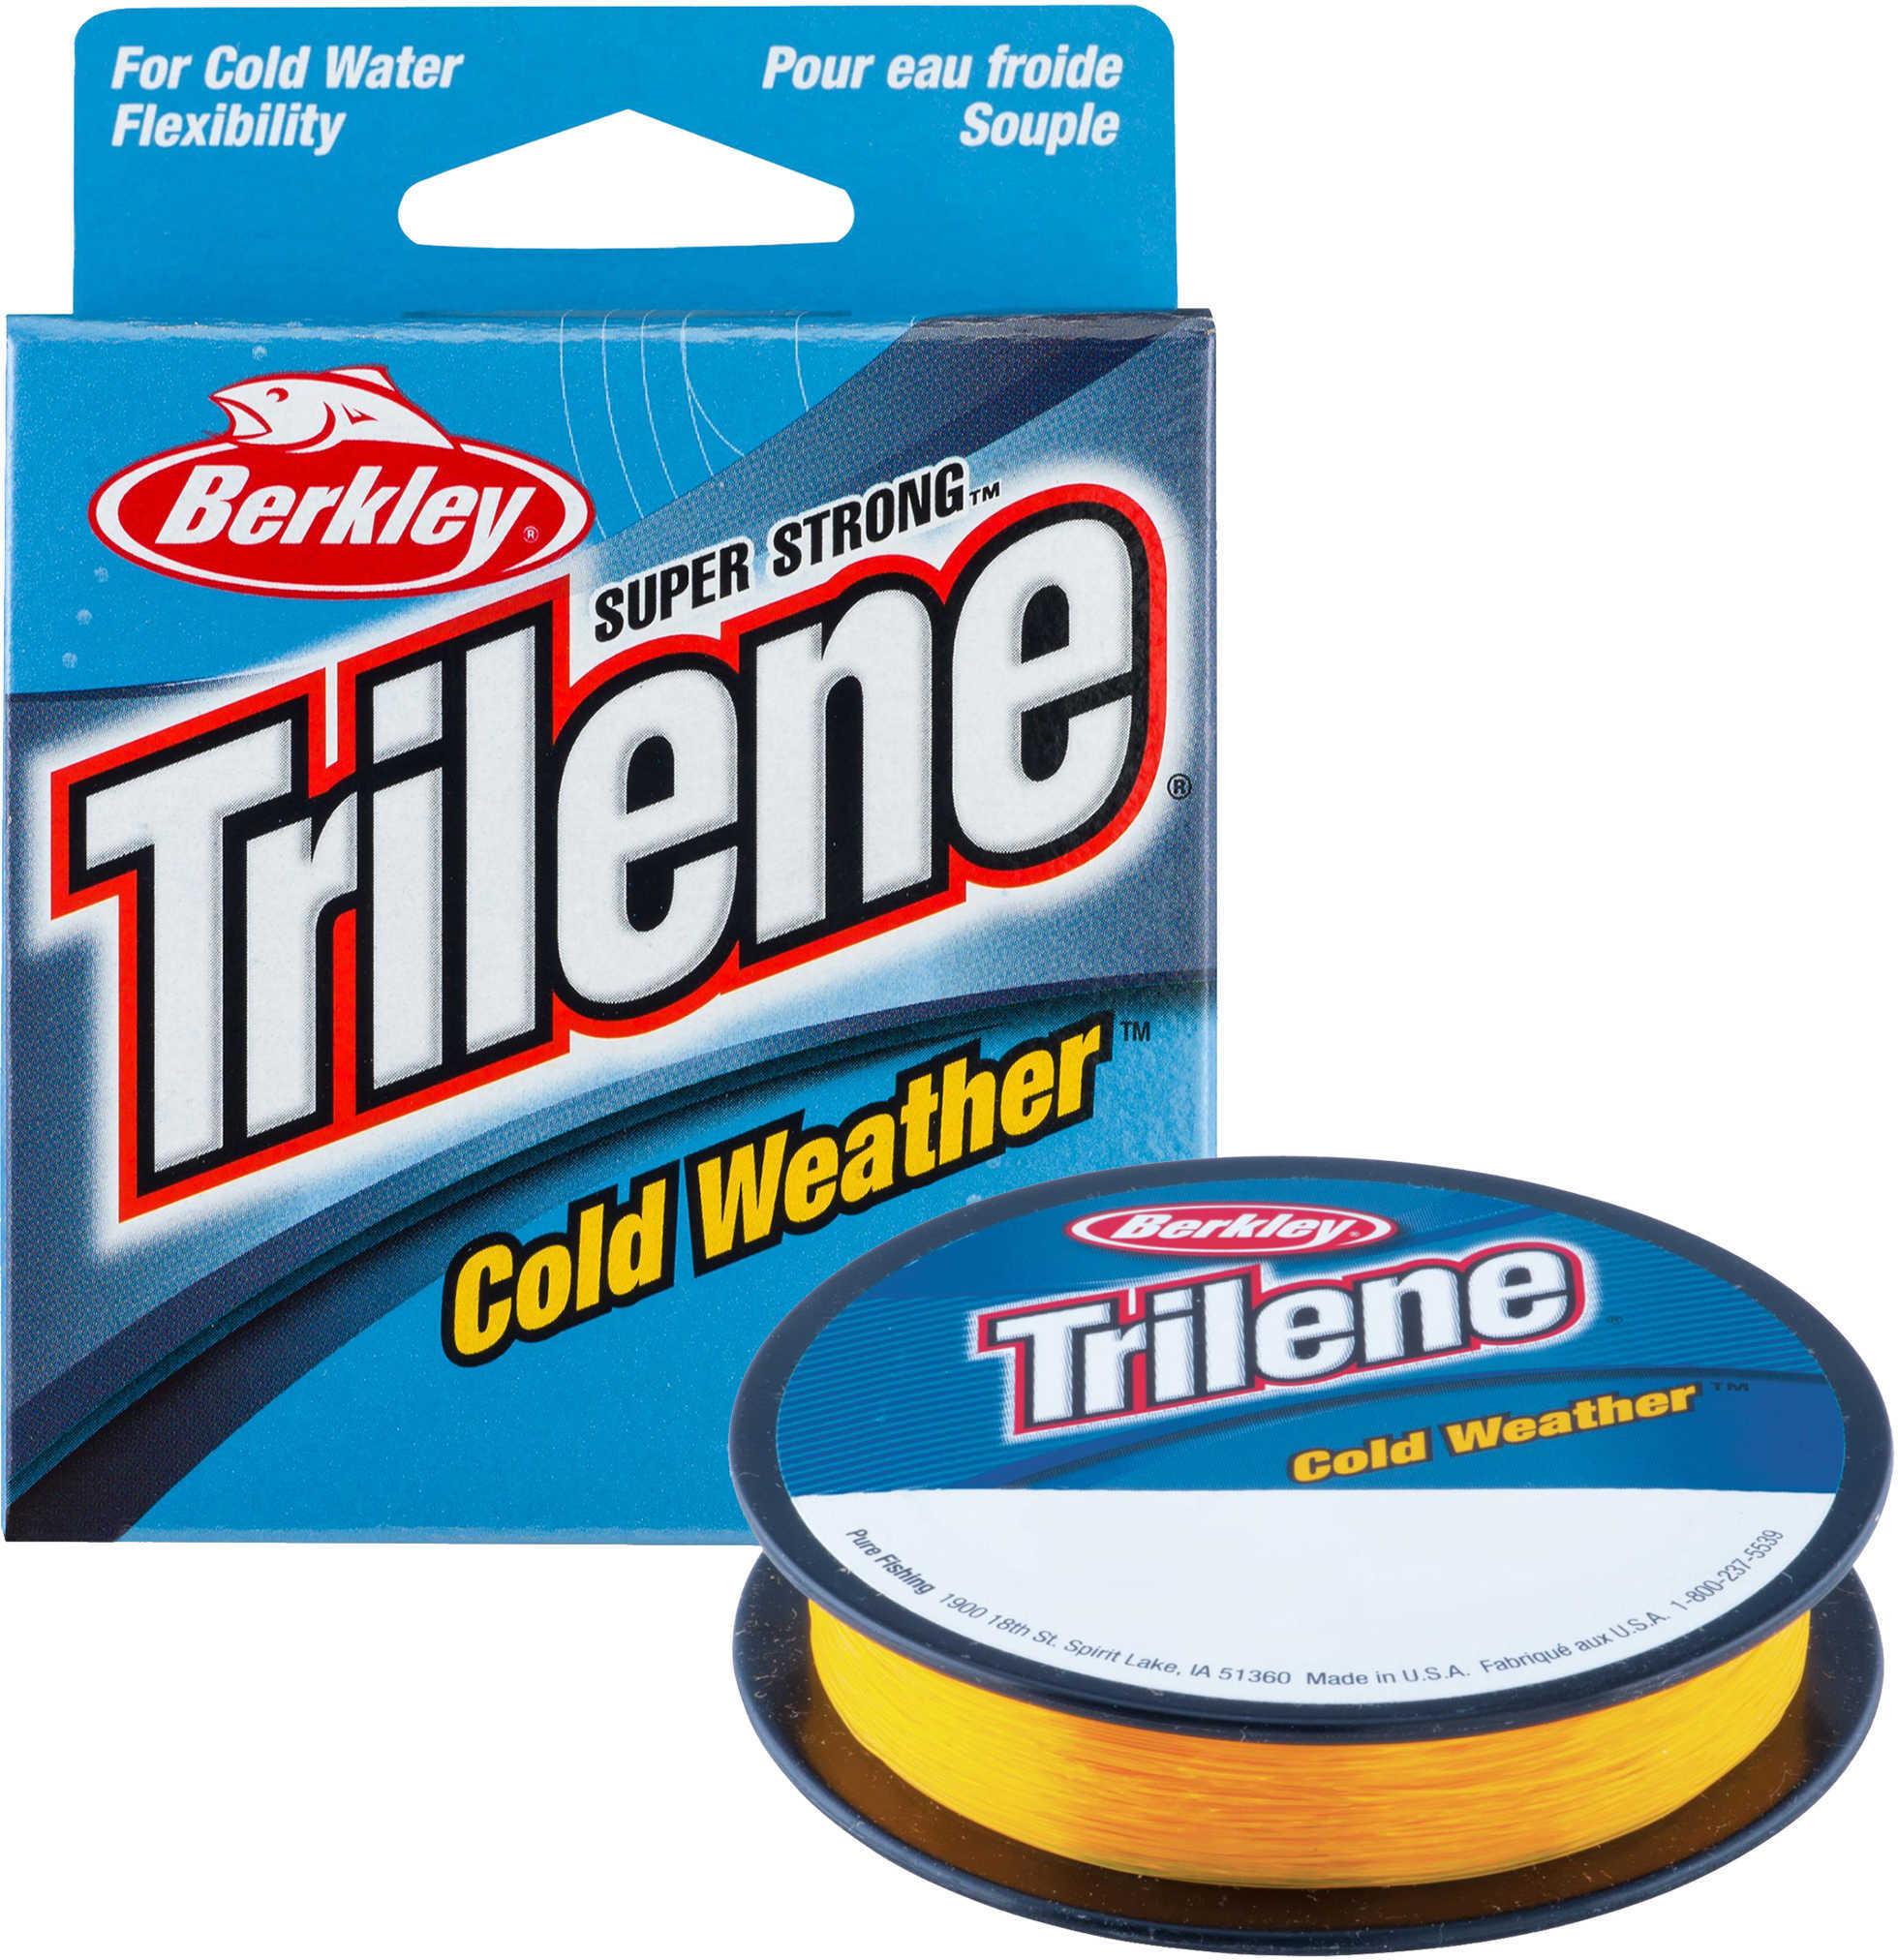 "Berkley Trilene Cold Weather Monofilament Line 4 lbs Breaking Strength, 0.008"" Diameter, 110 Yards, Klondike Gold Md: 14"